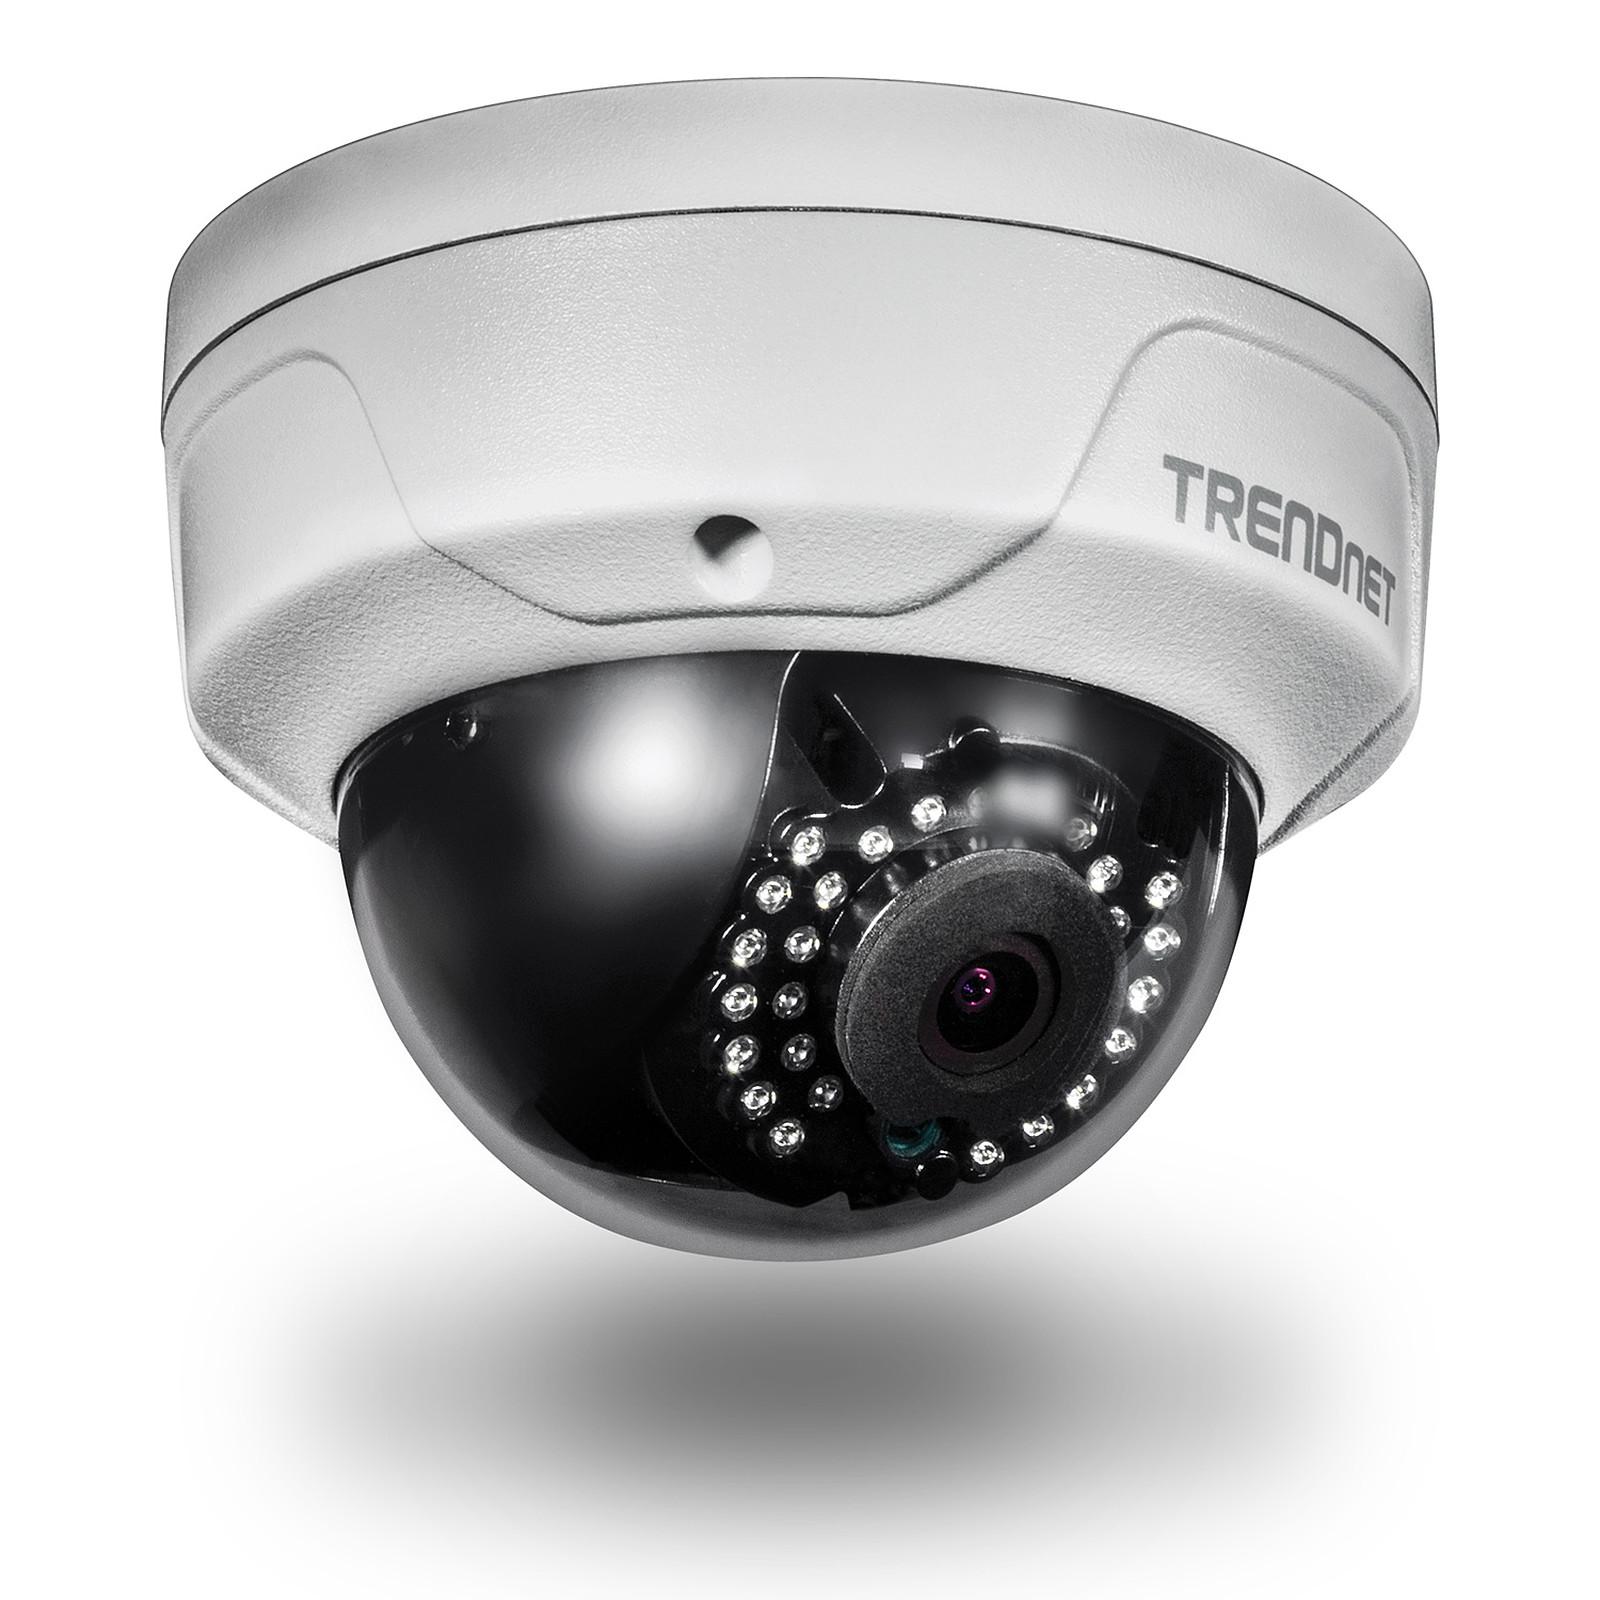 TRENDnet TV-IP315PI